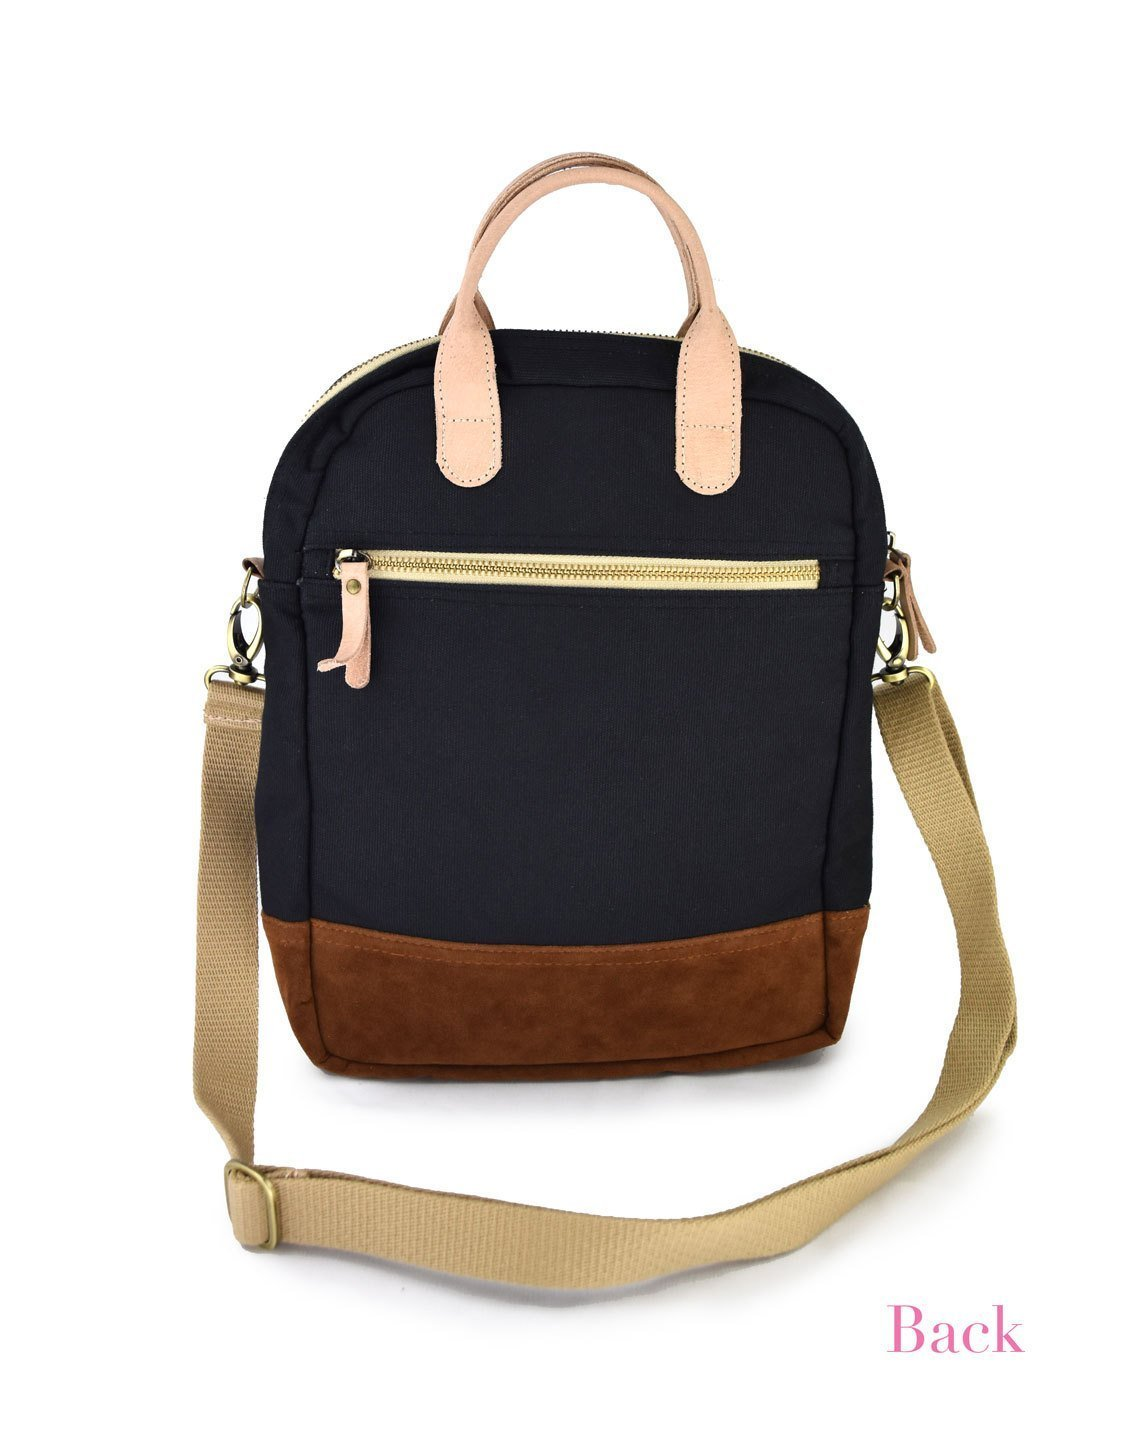 35fd273aa904f Amazon.com  Borann Black Monogram Purse Cross body Shoulder Bag Personalized  Your Name  Handmade